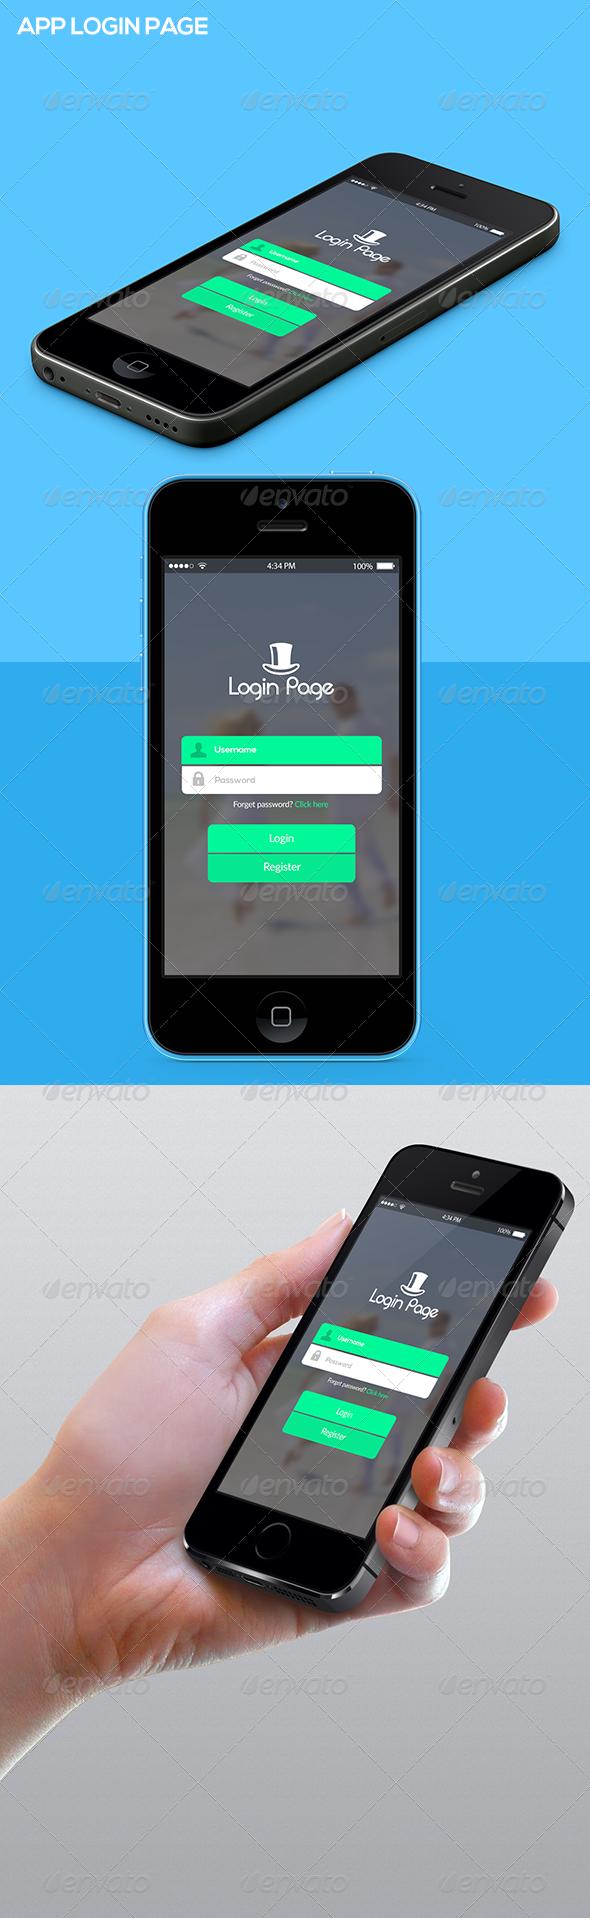 App Login Page in 2020 App login, Login page, Design